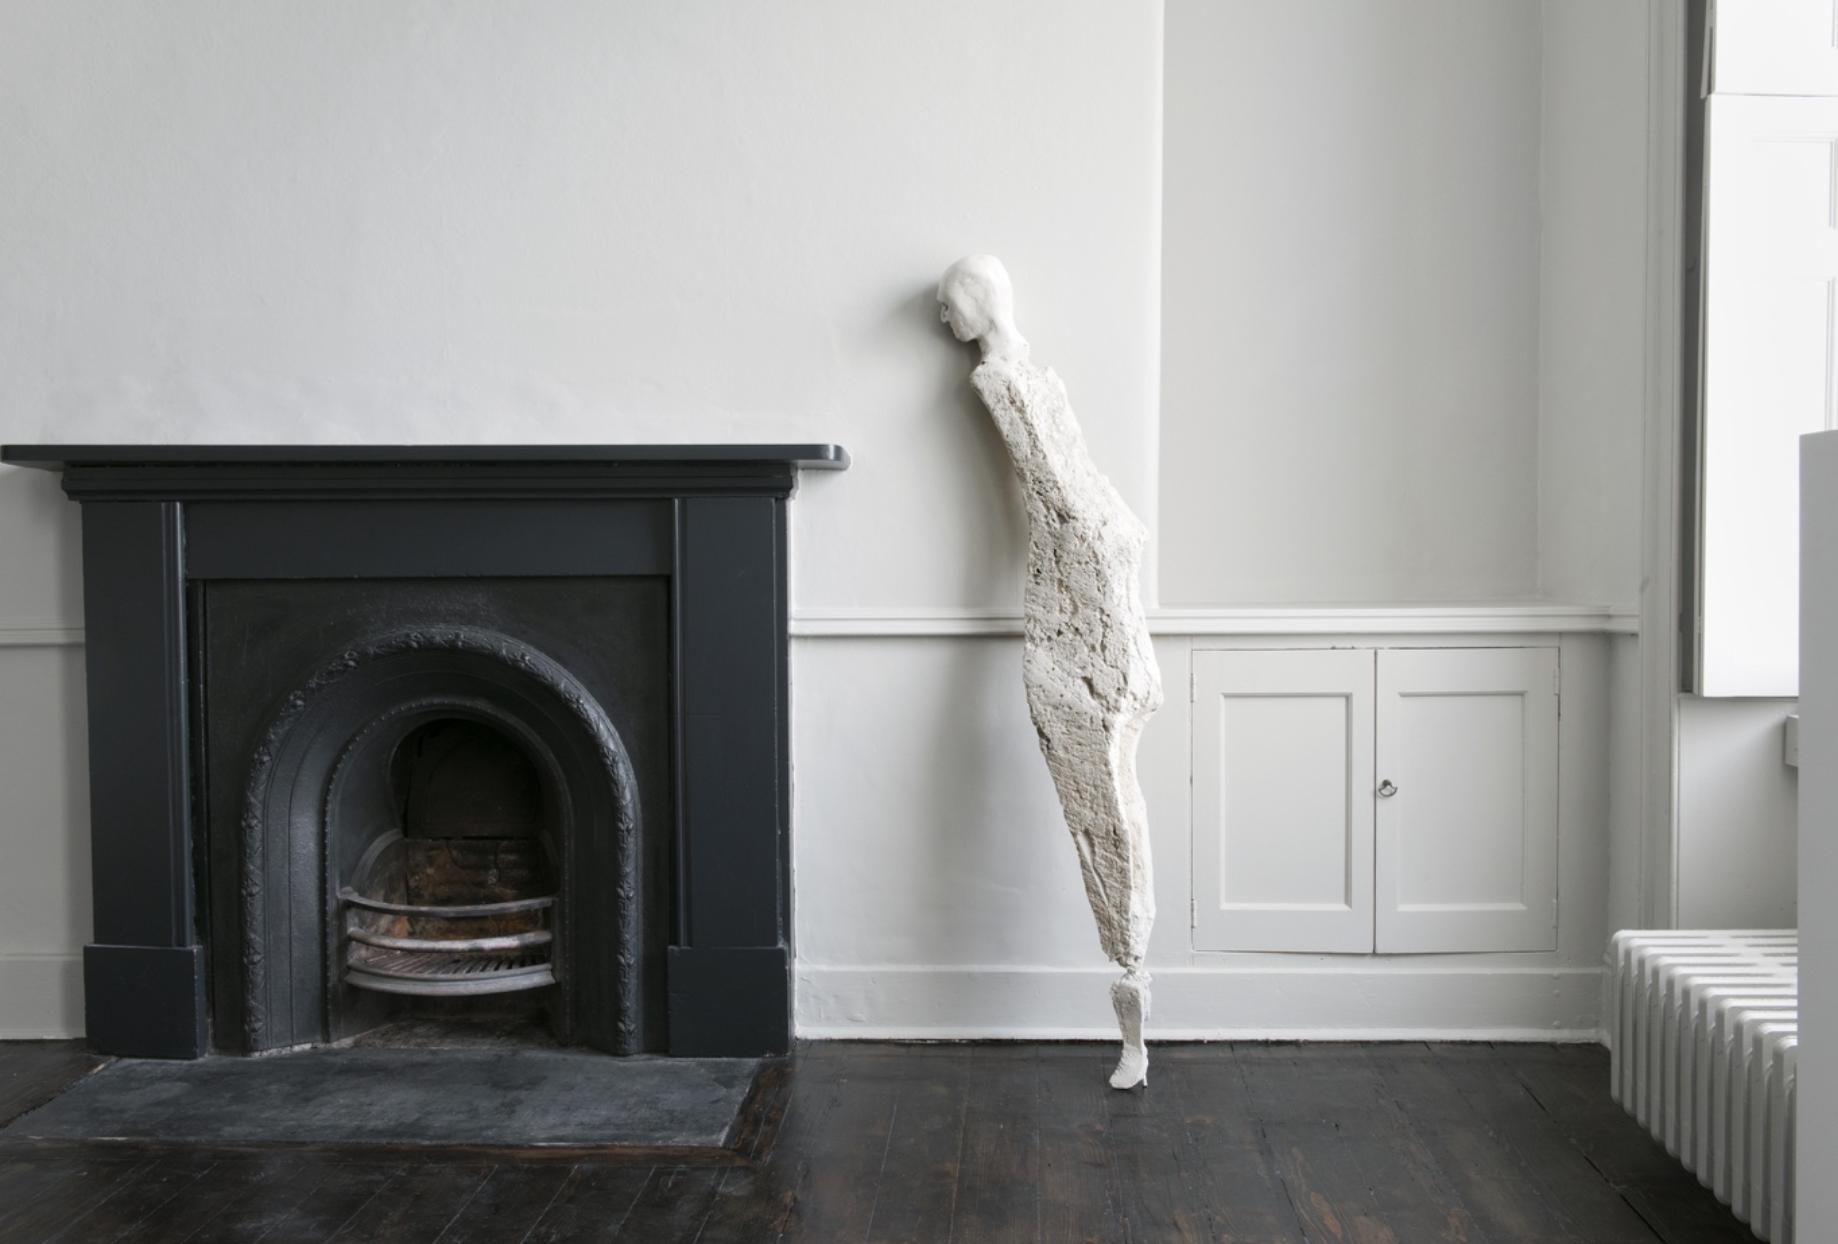 Installation view – Enrico David